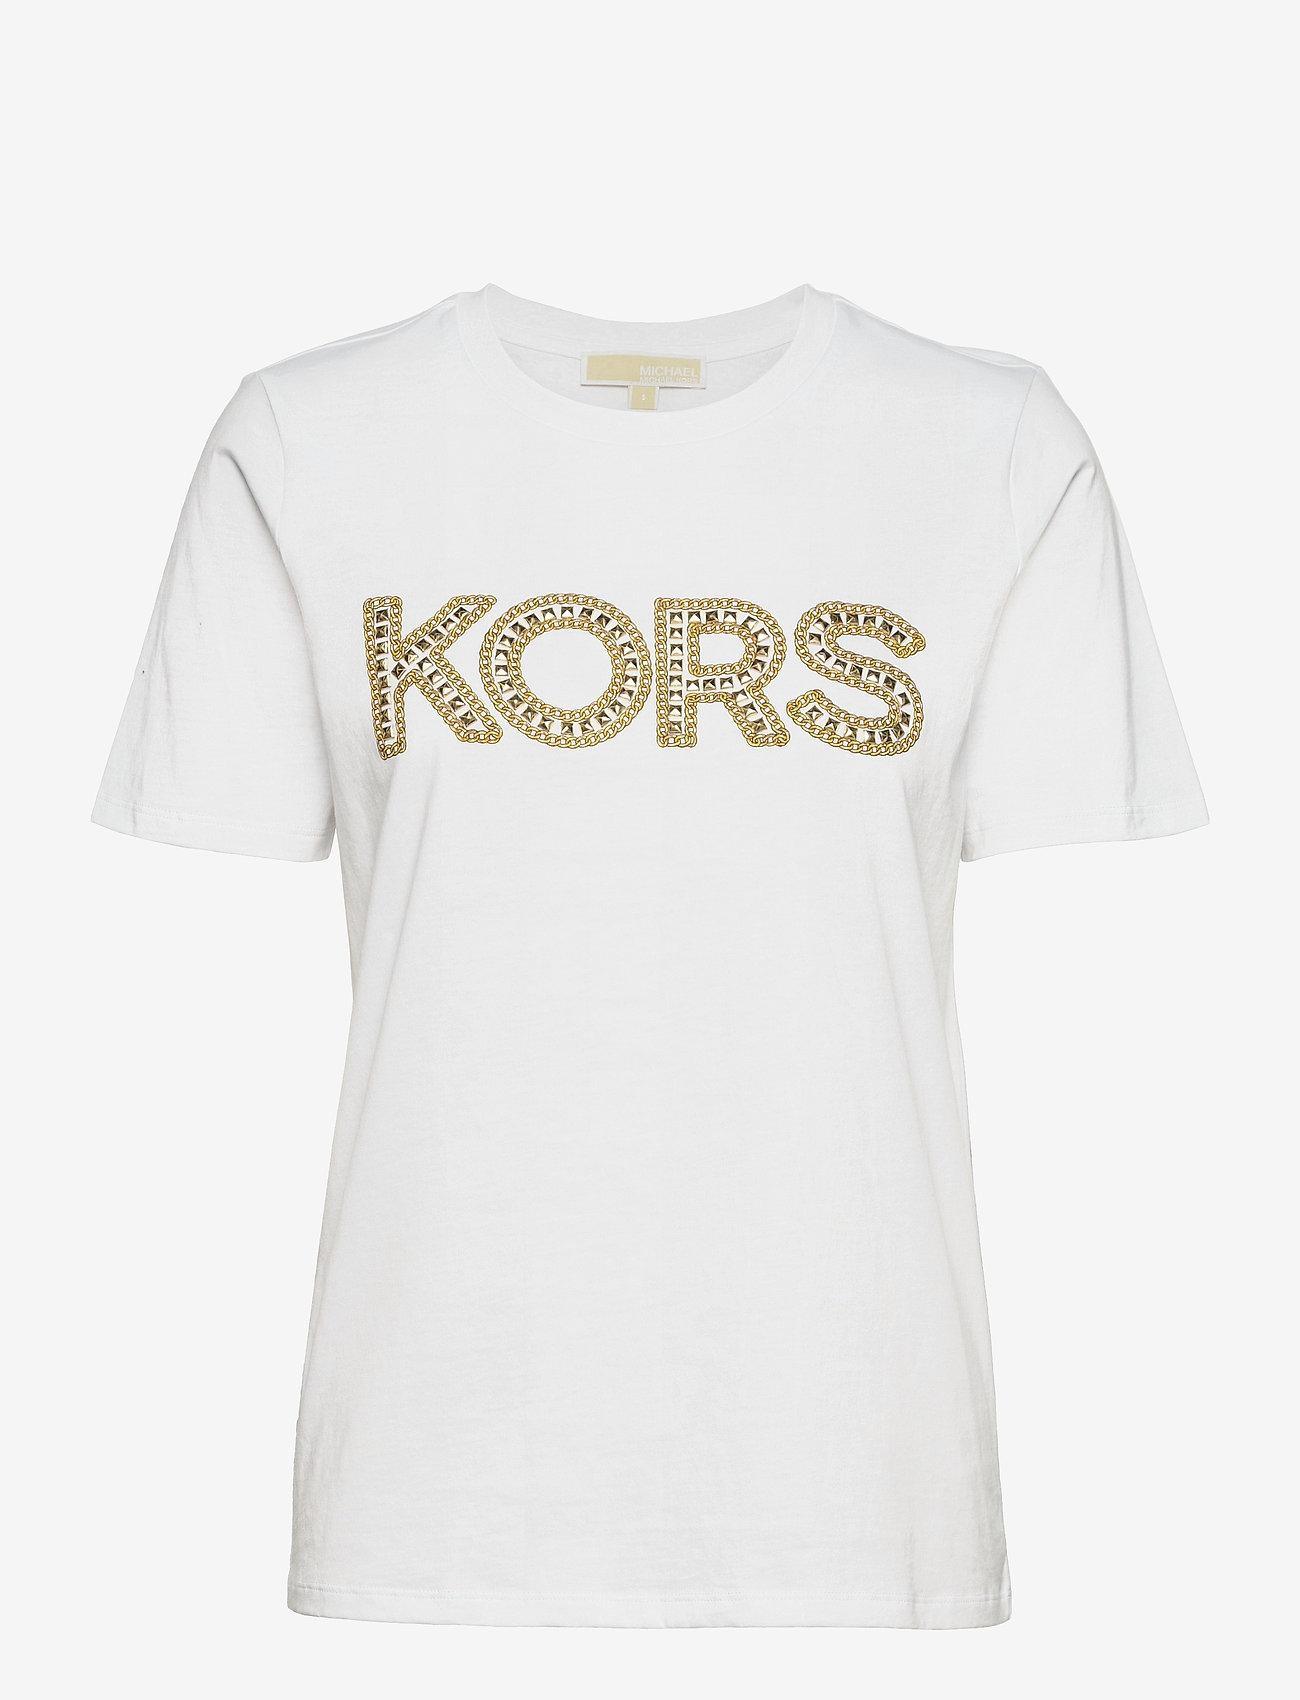 Michael Kors - KORS STUDDED CLASSIC TEE - t-shirts - white - 0